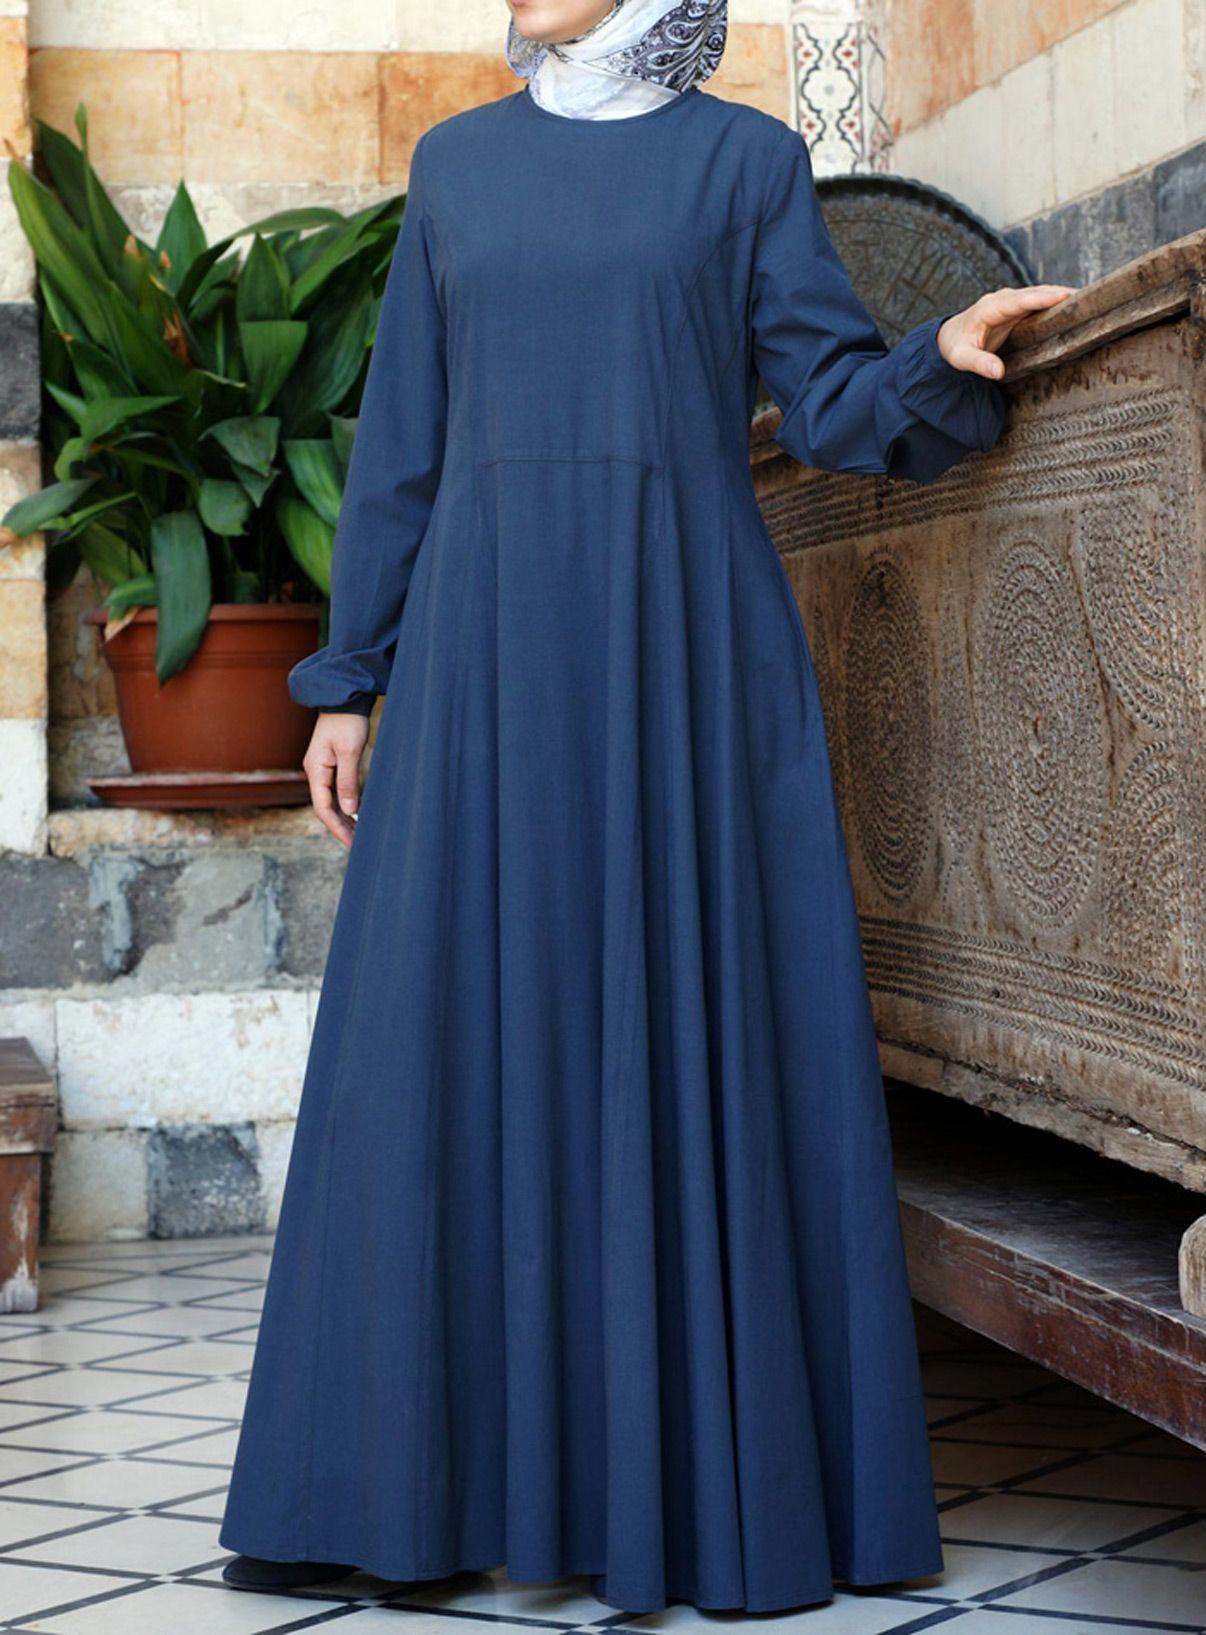 Shukr usa nuria abaya in raincloud i wore this one on umrah and